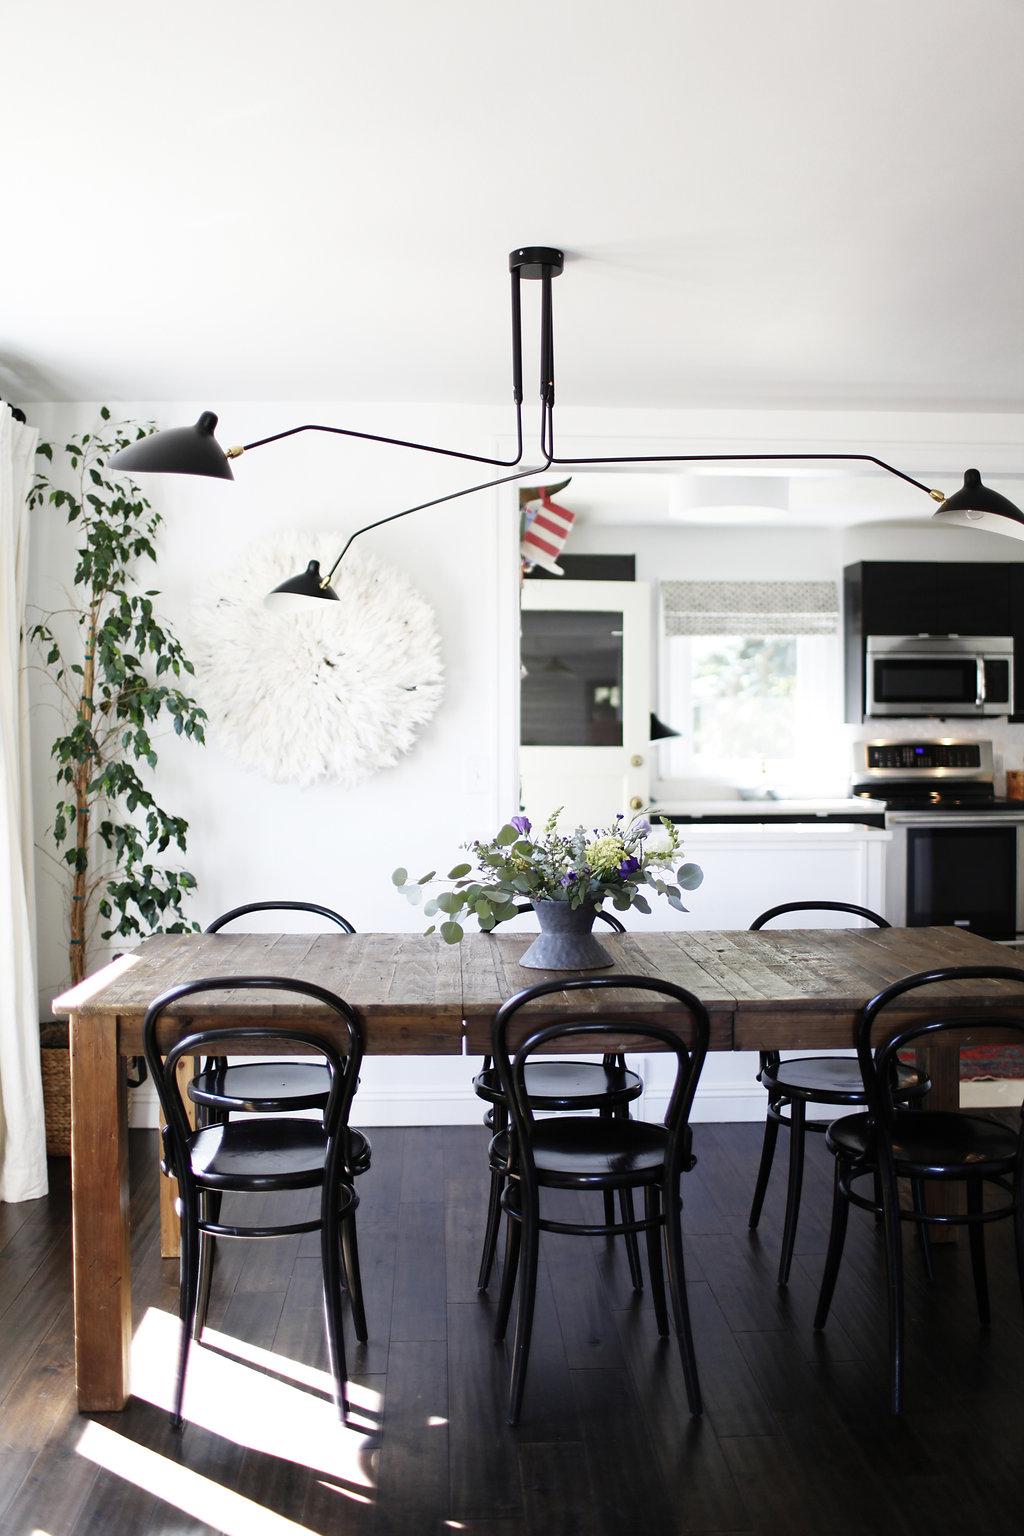 Dark bentwood chairs via RUE